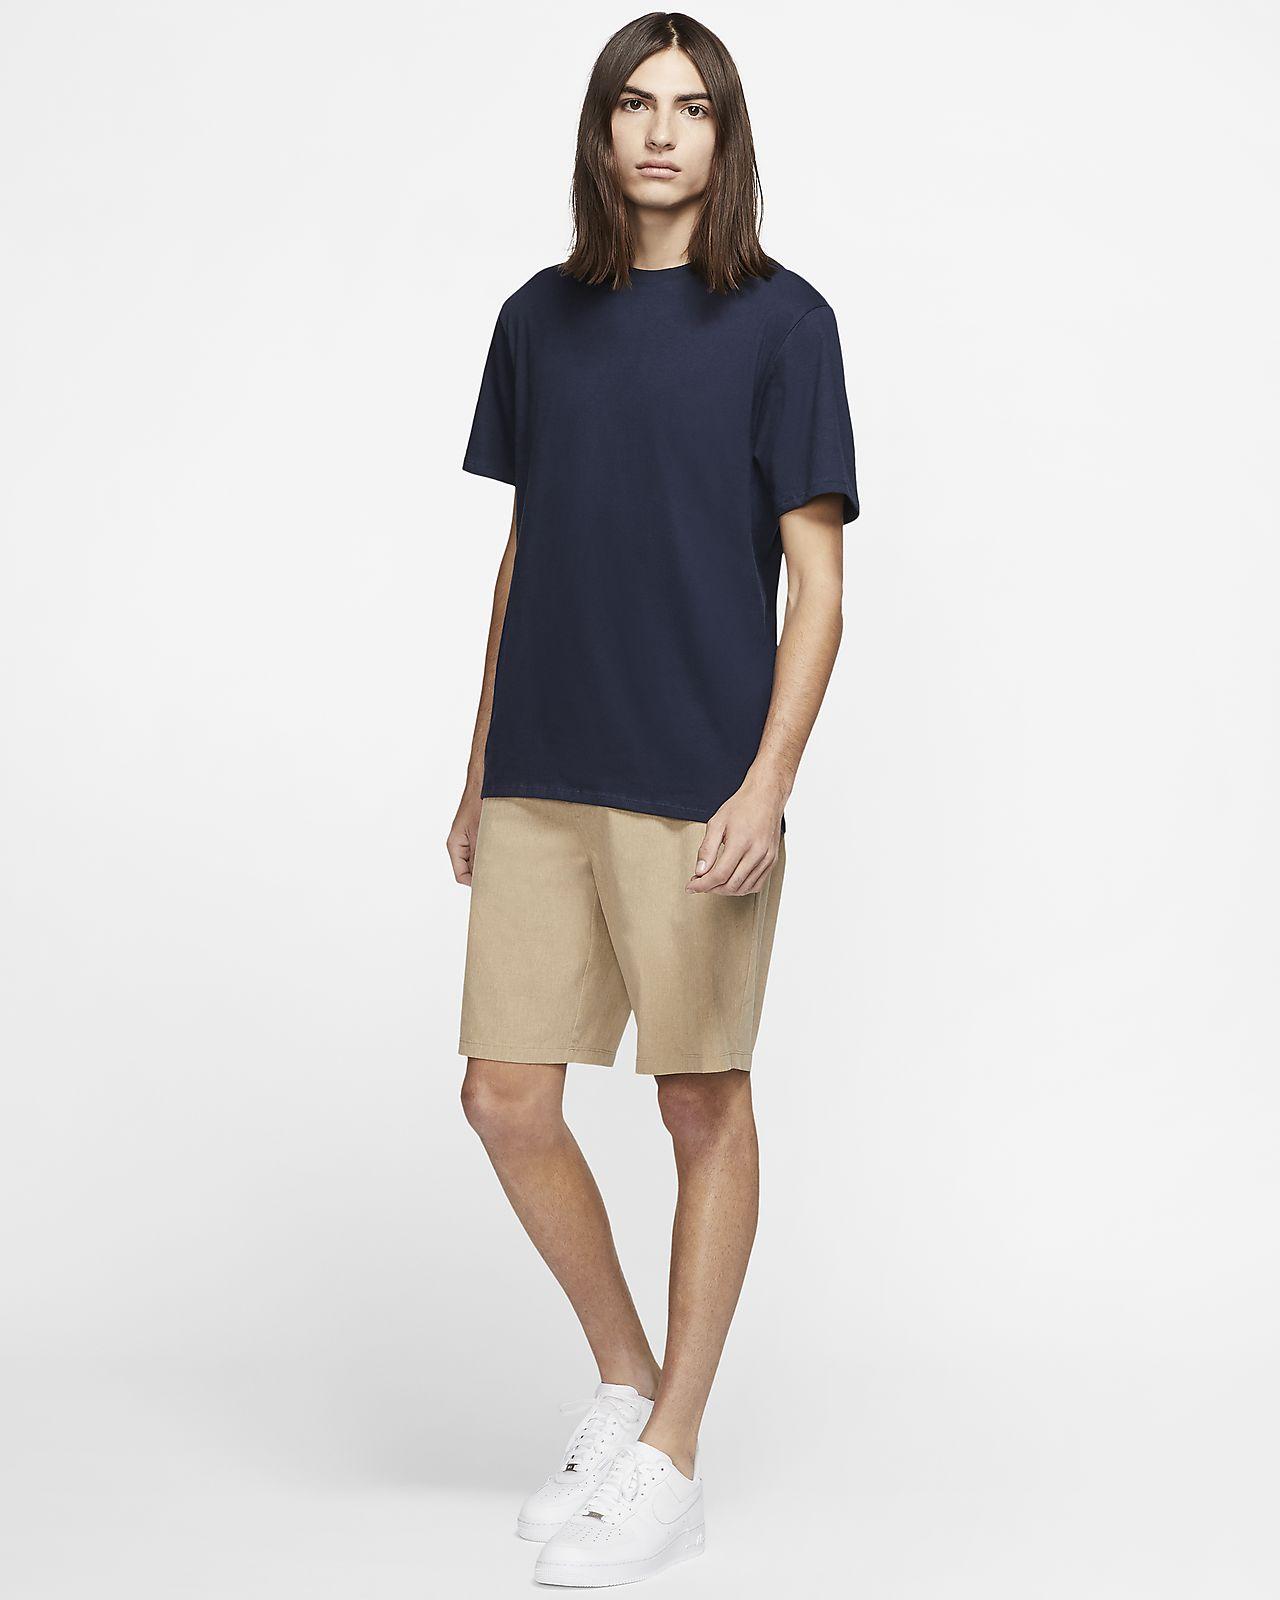 Hurley Premium Staple Men's T Shirt